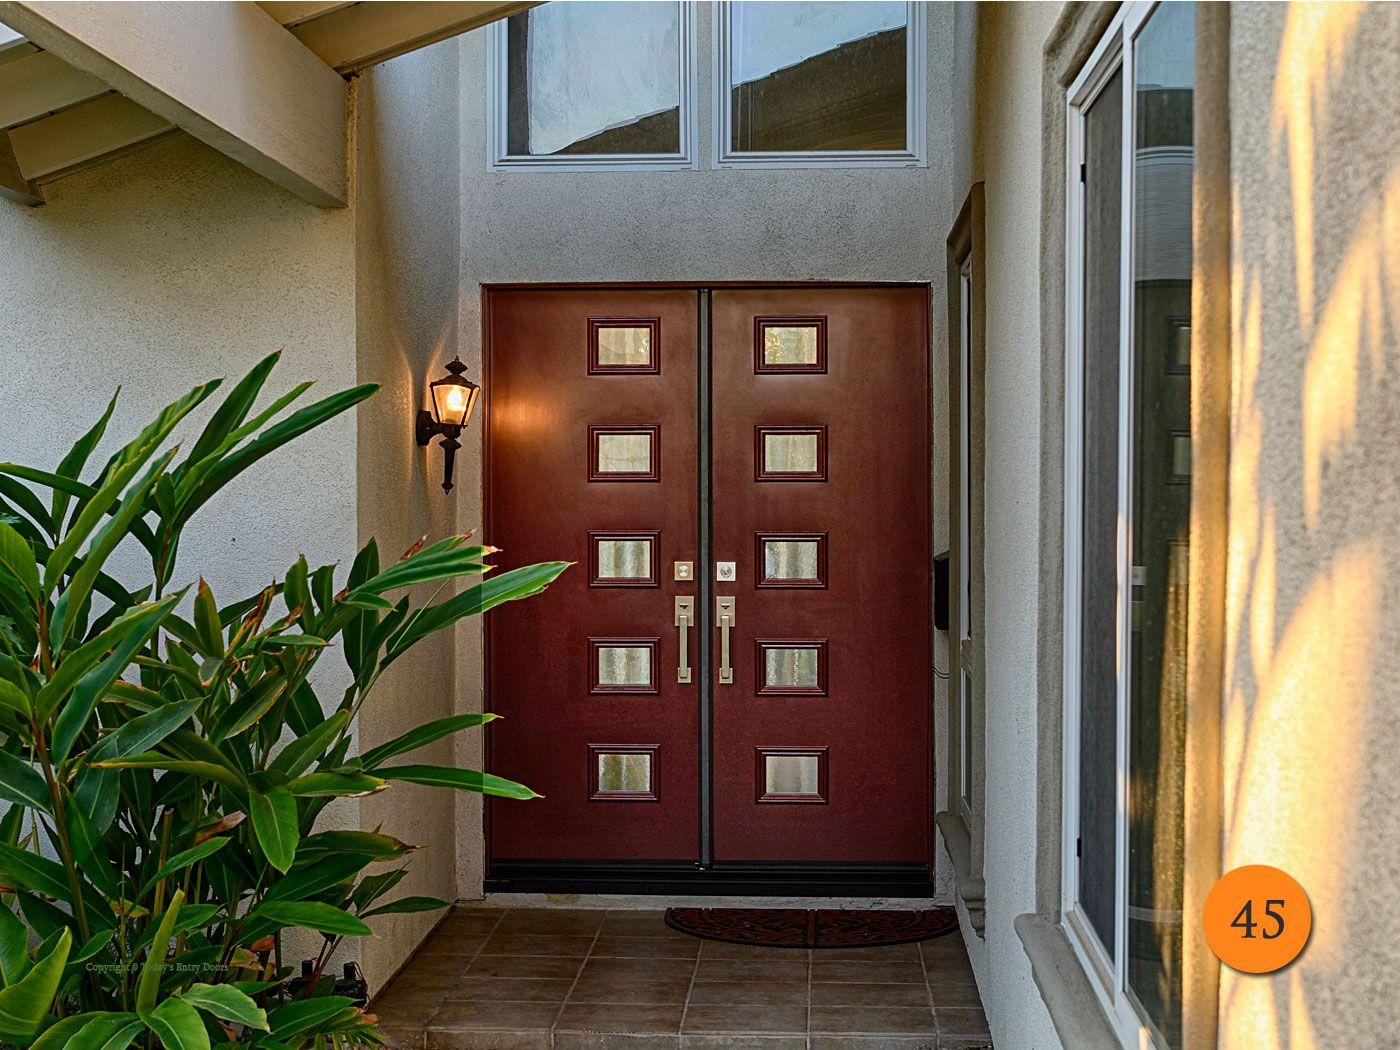 Modern 30 Inch Fiberglass Double Entry Doors 2 30x80 In 5 Foot Wide